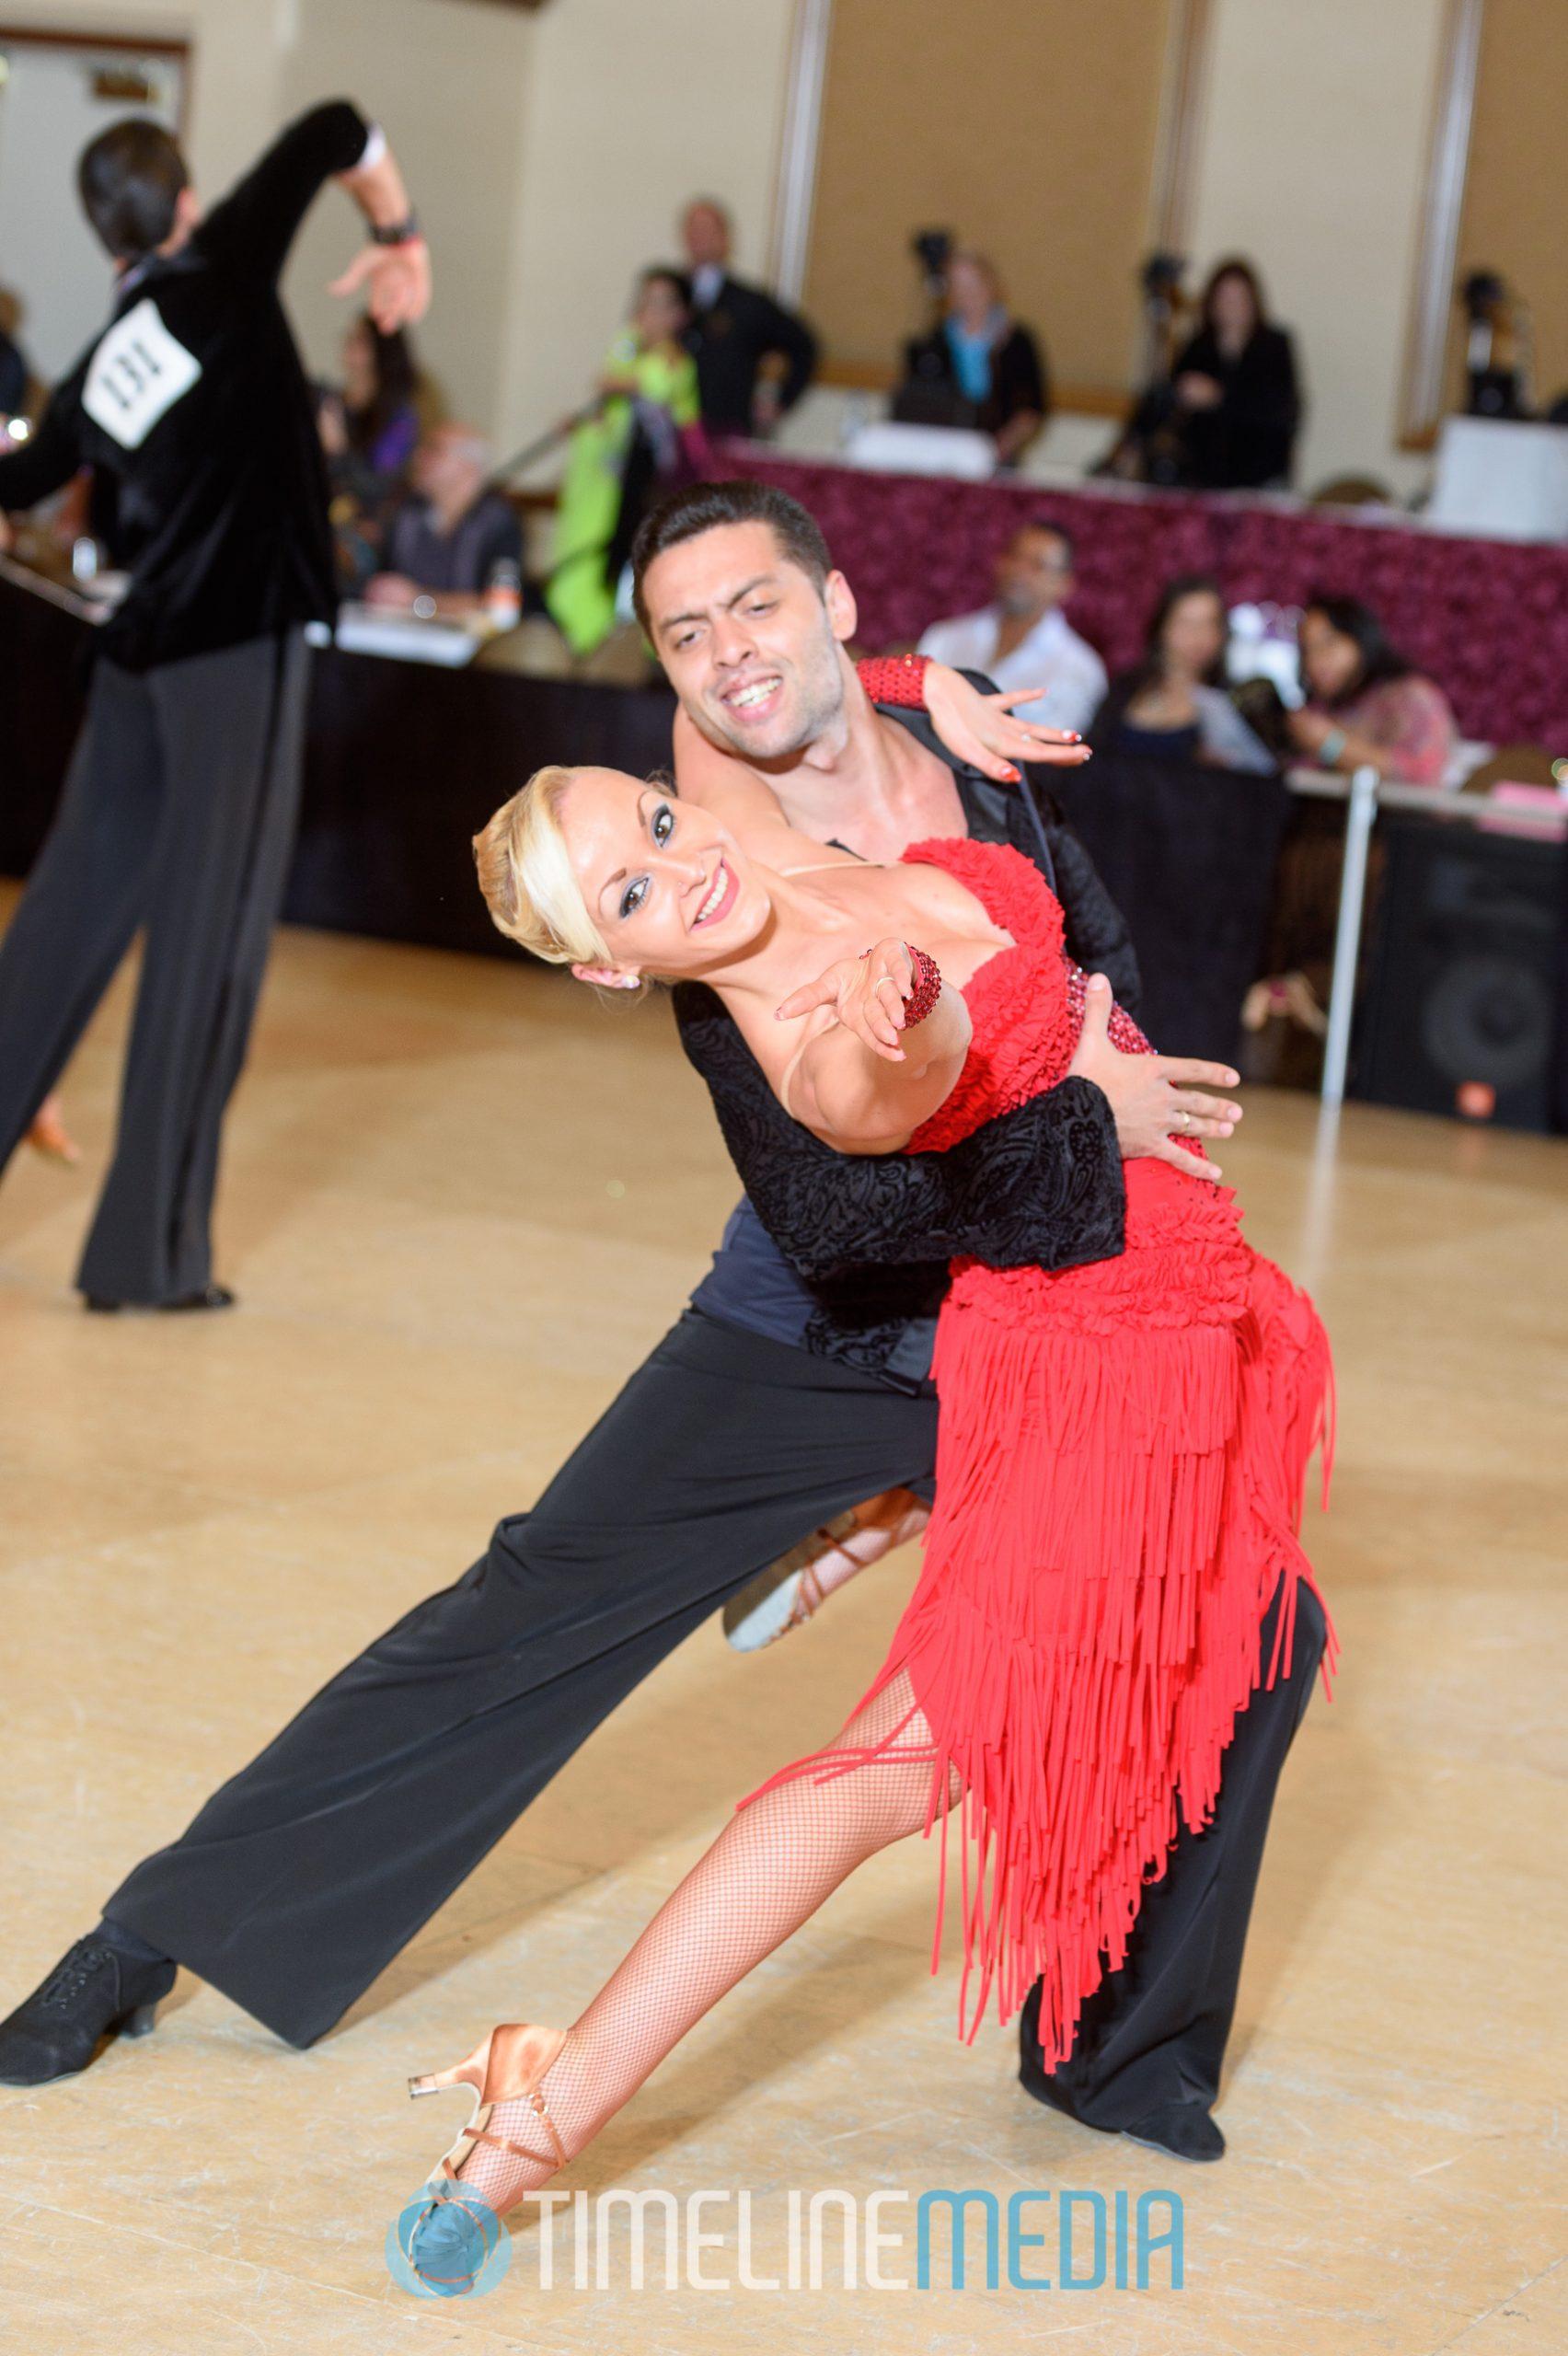 Dancing at the Bally's Ballroom Atlantic City, NJ ©TimeLine Media